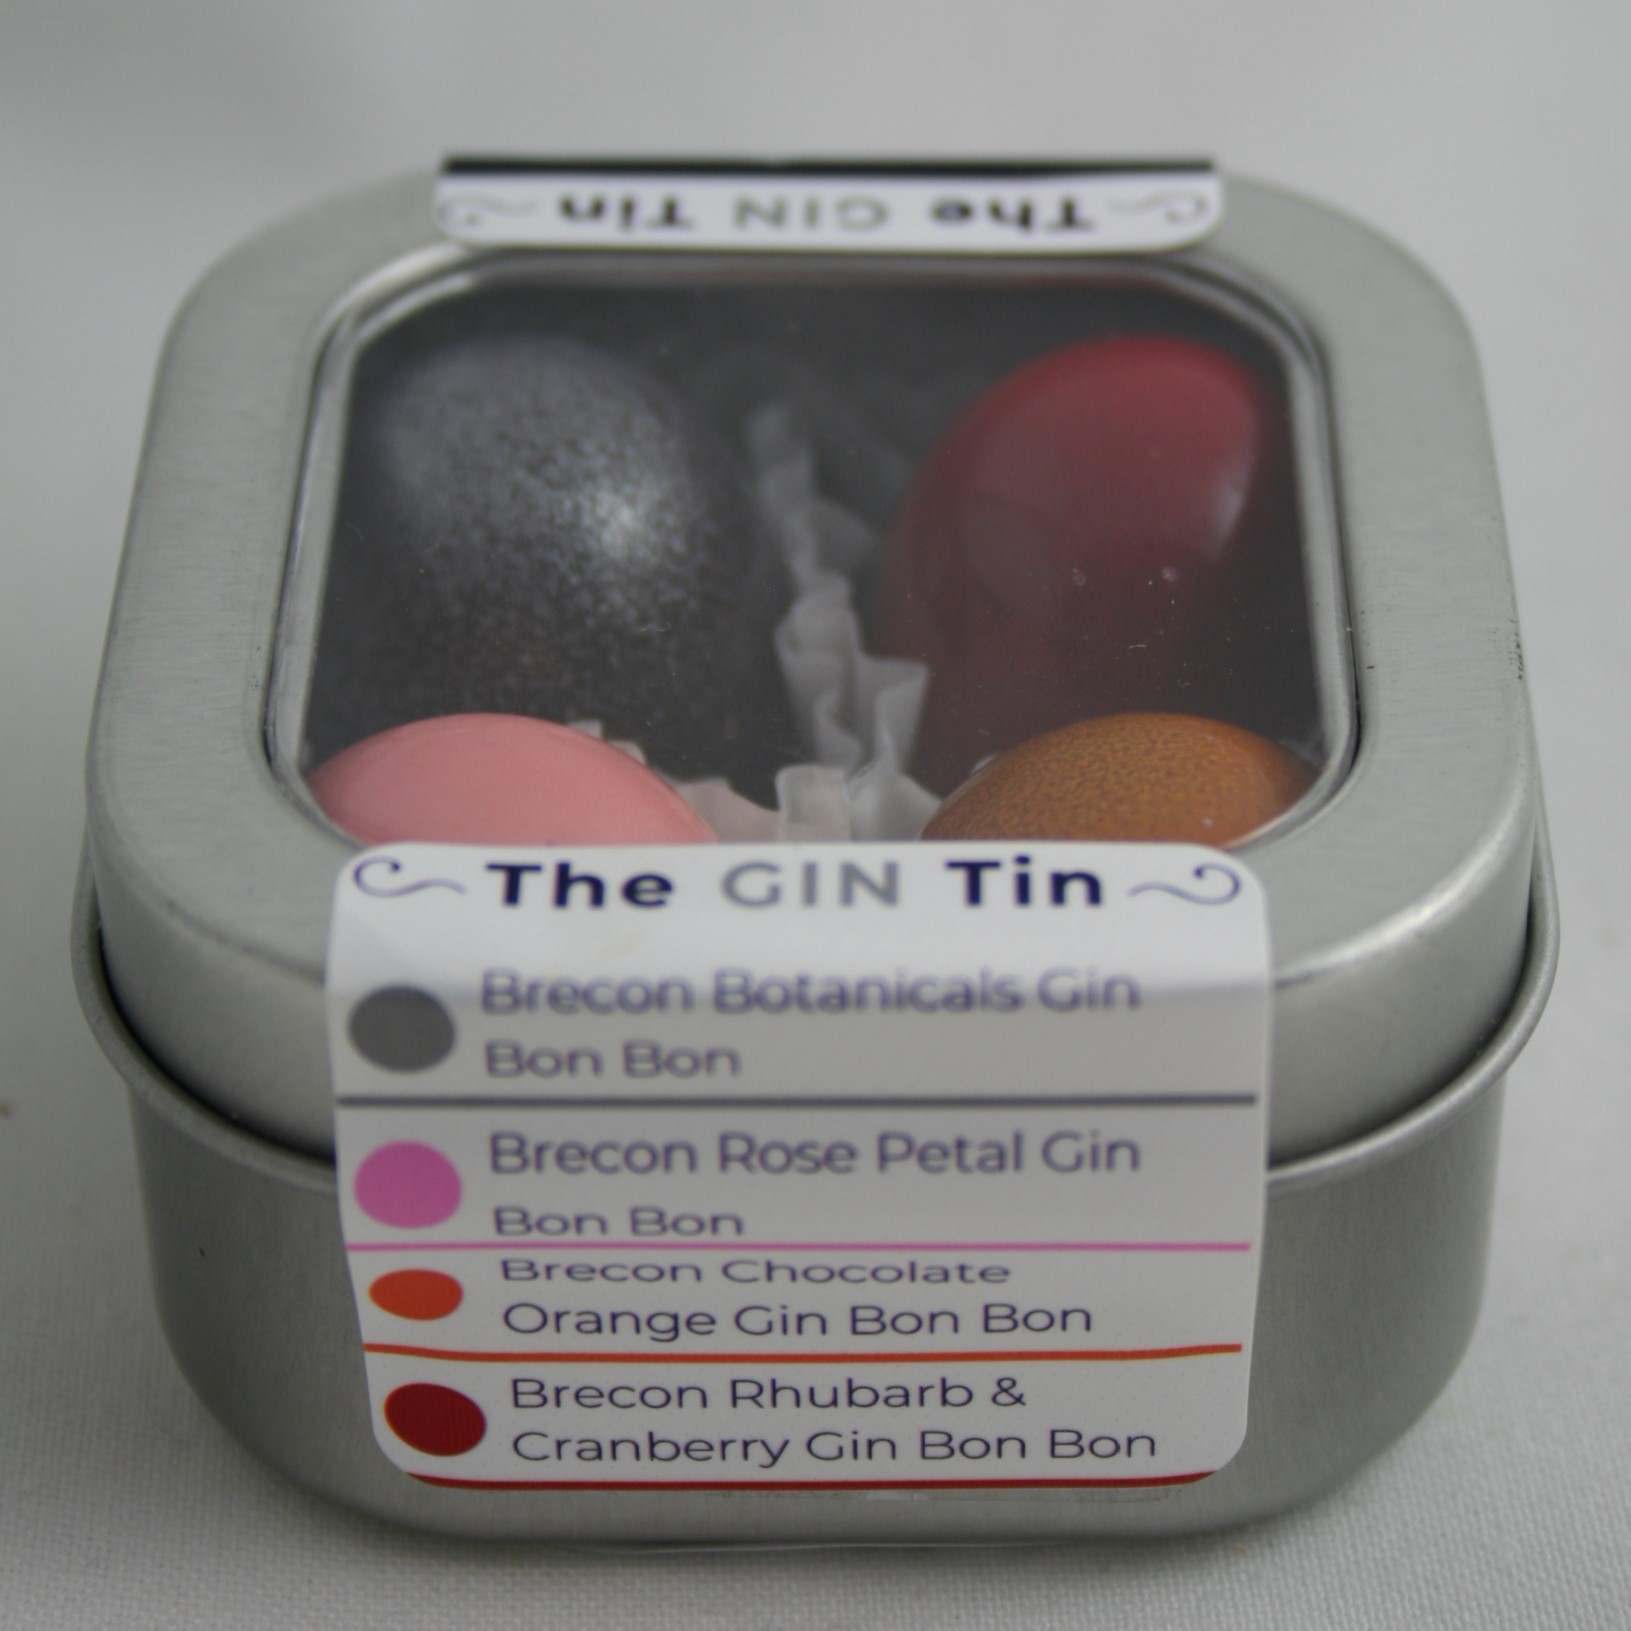 The Brecon Gin Tin. Dark Chocolate Botanicals. White chocolate Rose Gin. Milk Chocolate Orange Gin and Milk Chocolate Rhubarb and Cranberry Gi